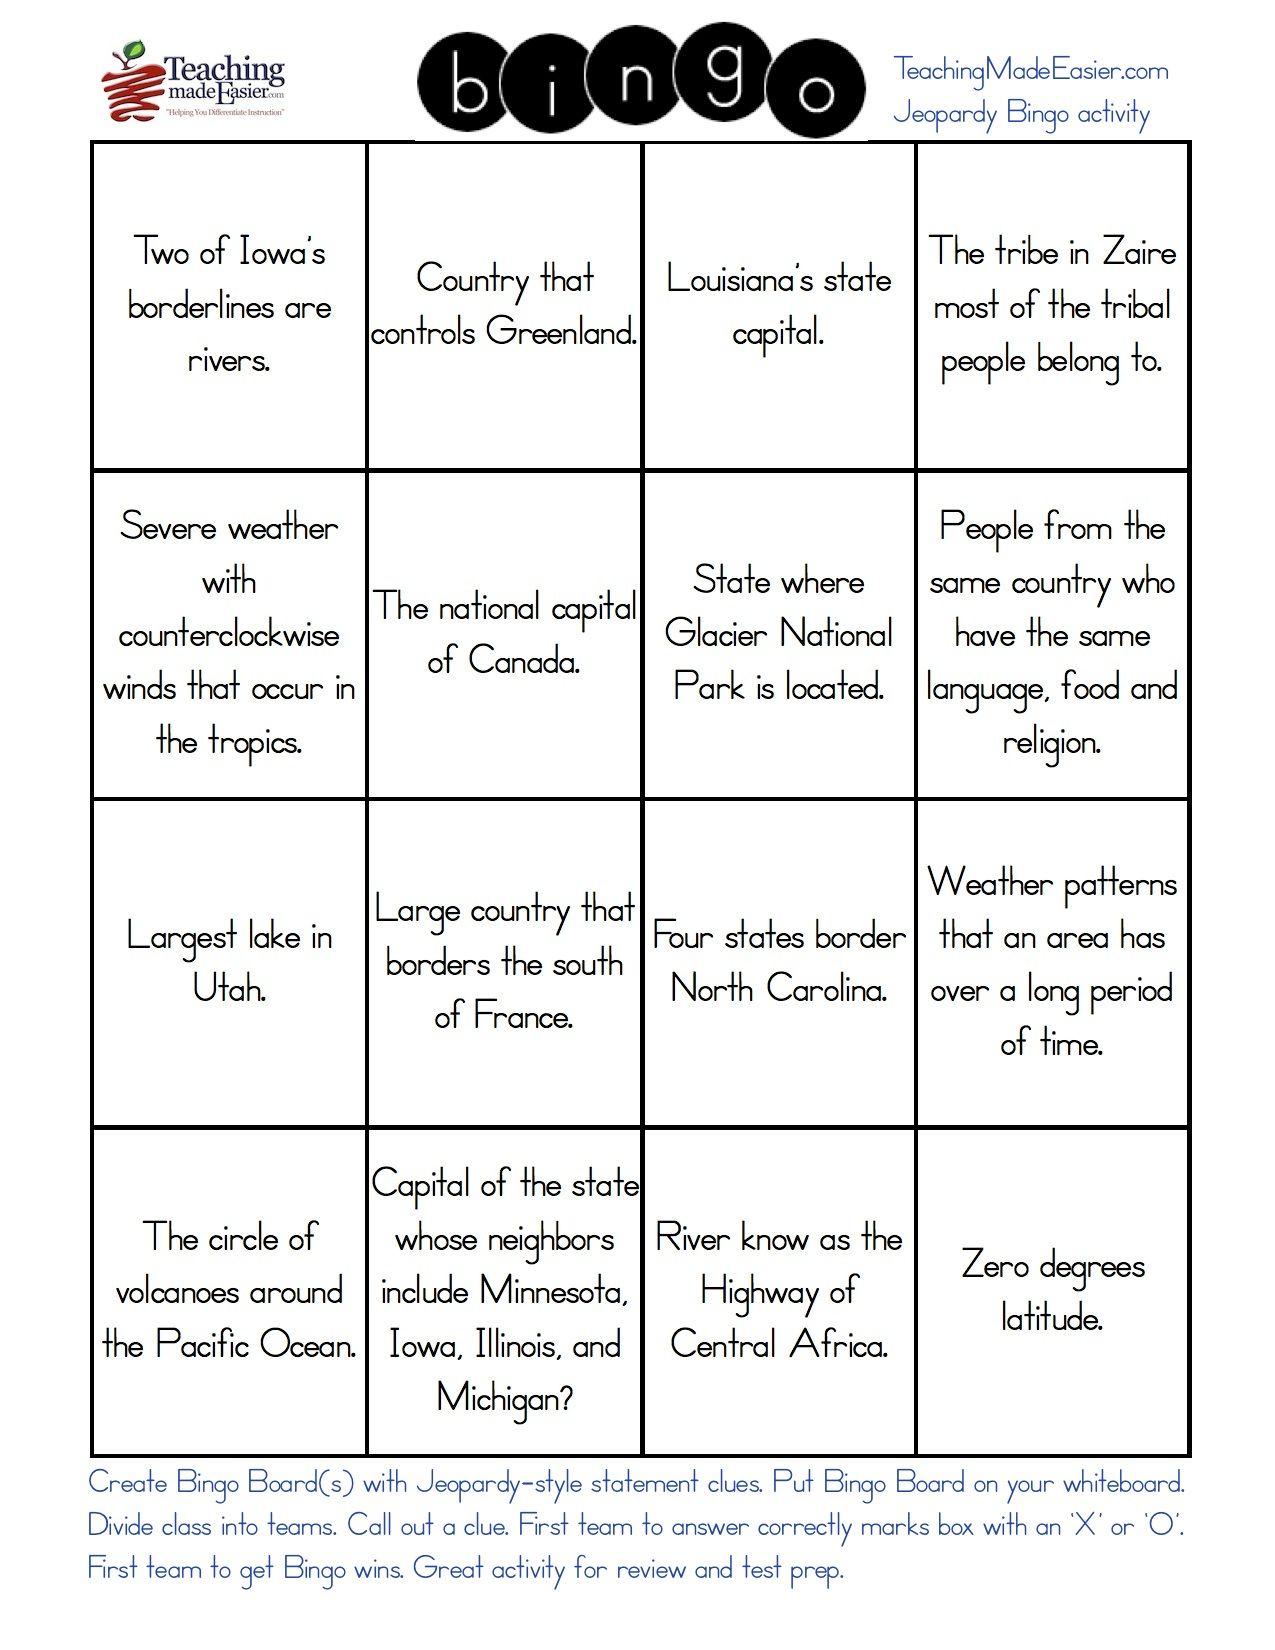 Create Custom Jeopardy Bingo In 3 Easy Steps With